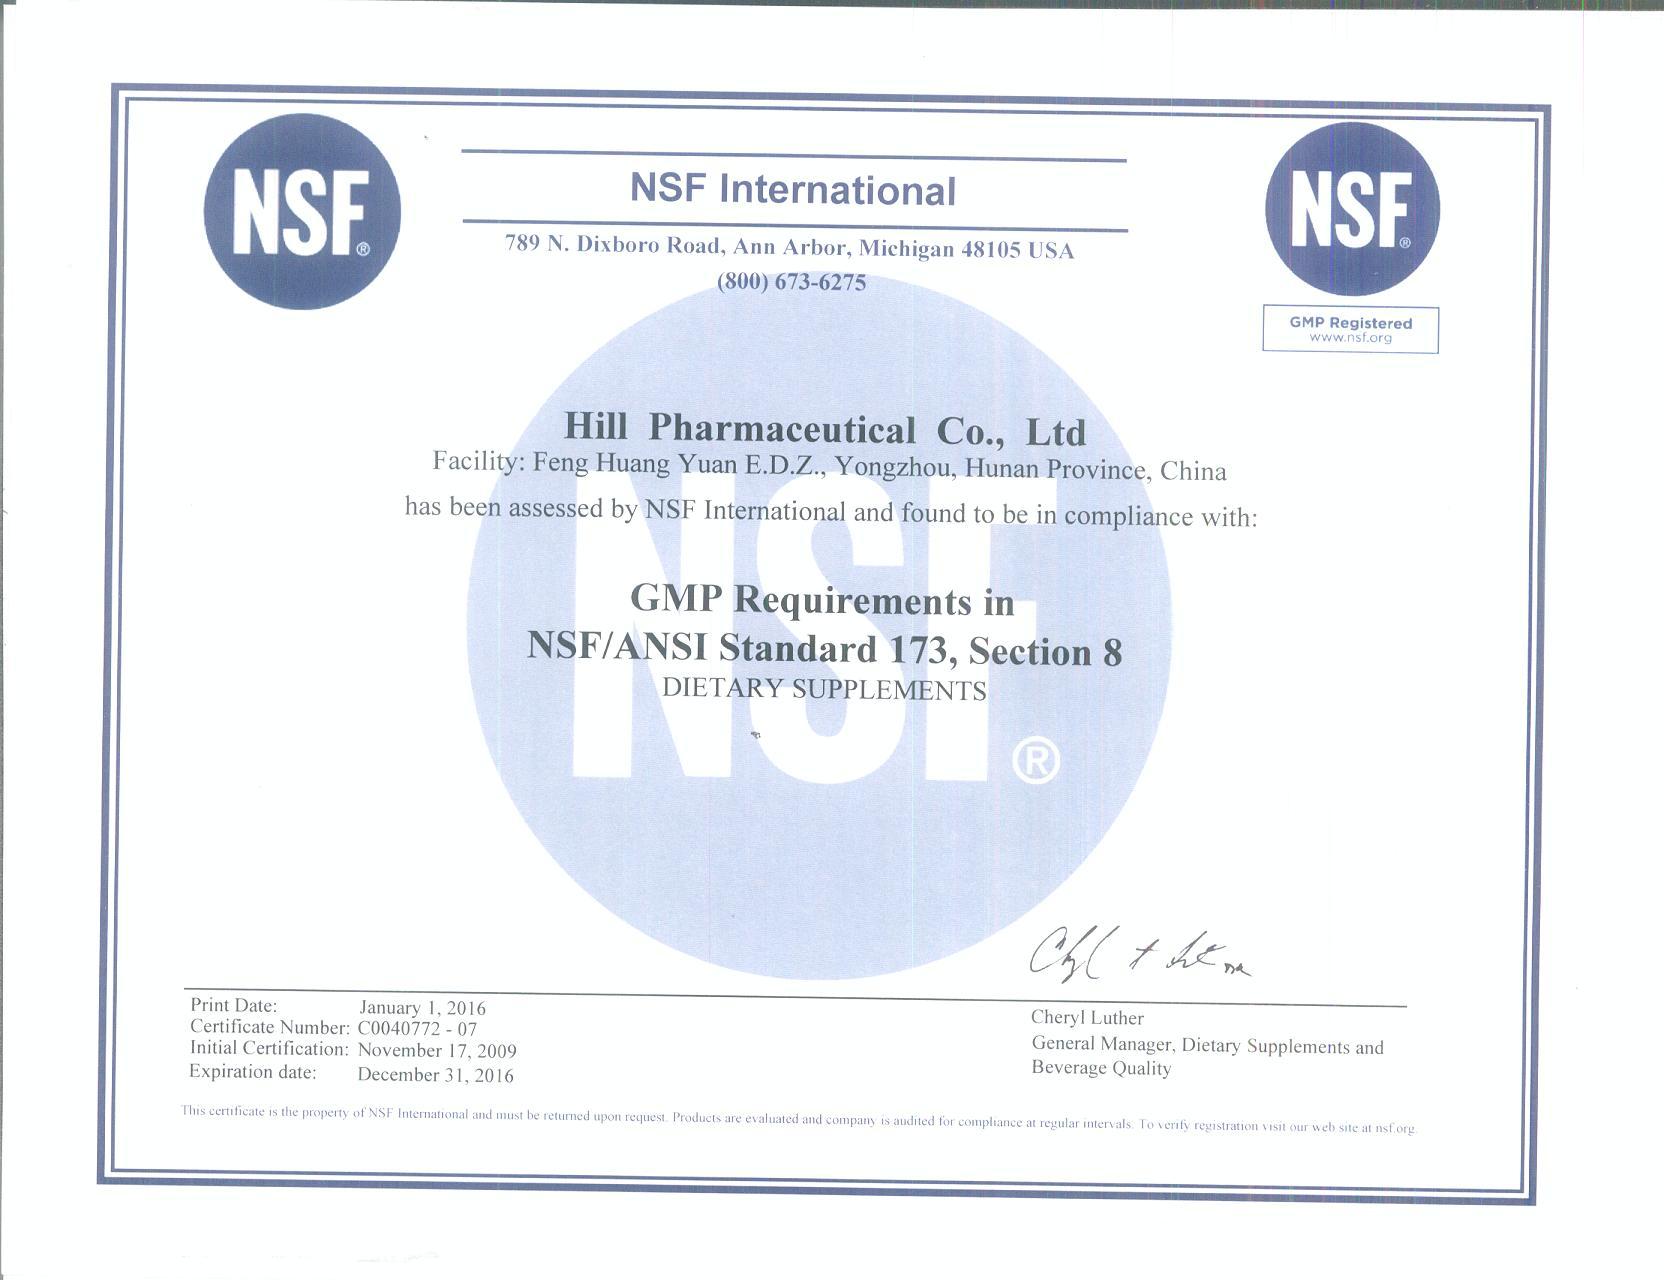 US cGMP - NSF International Certificate